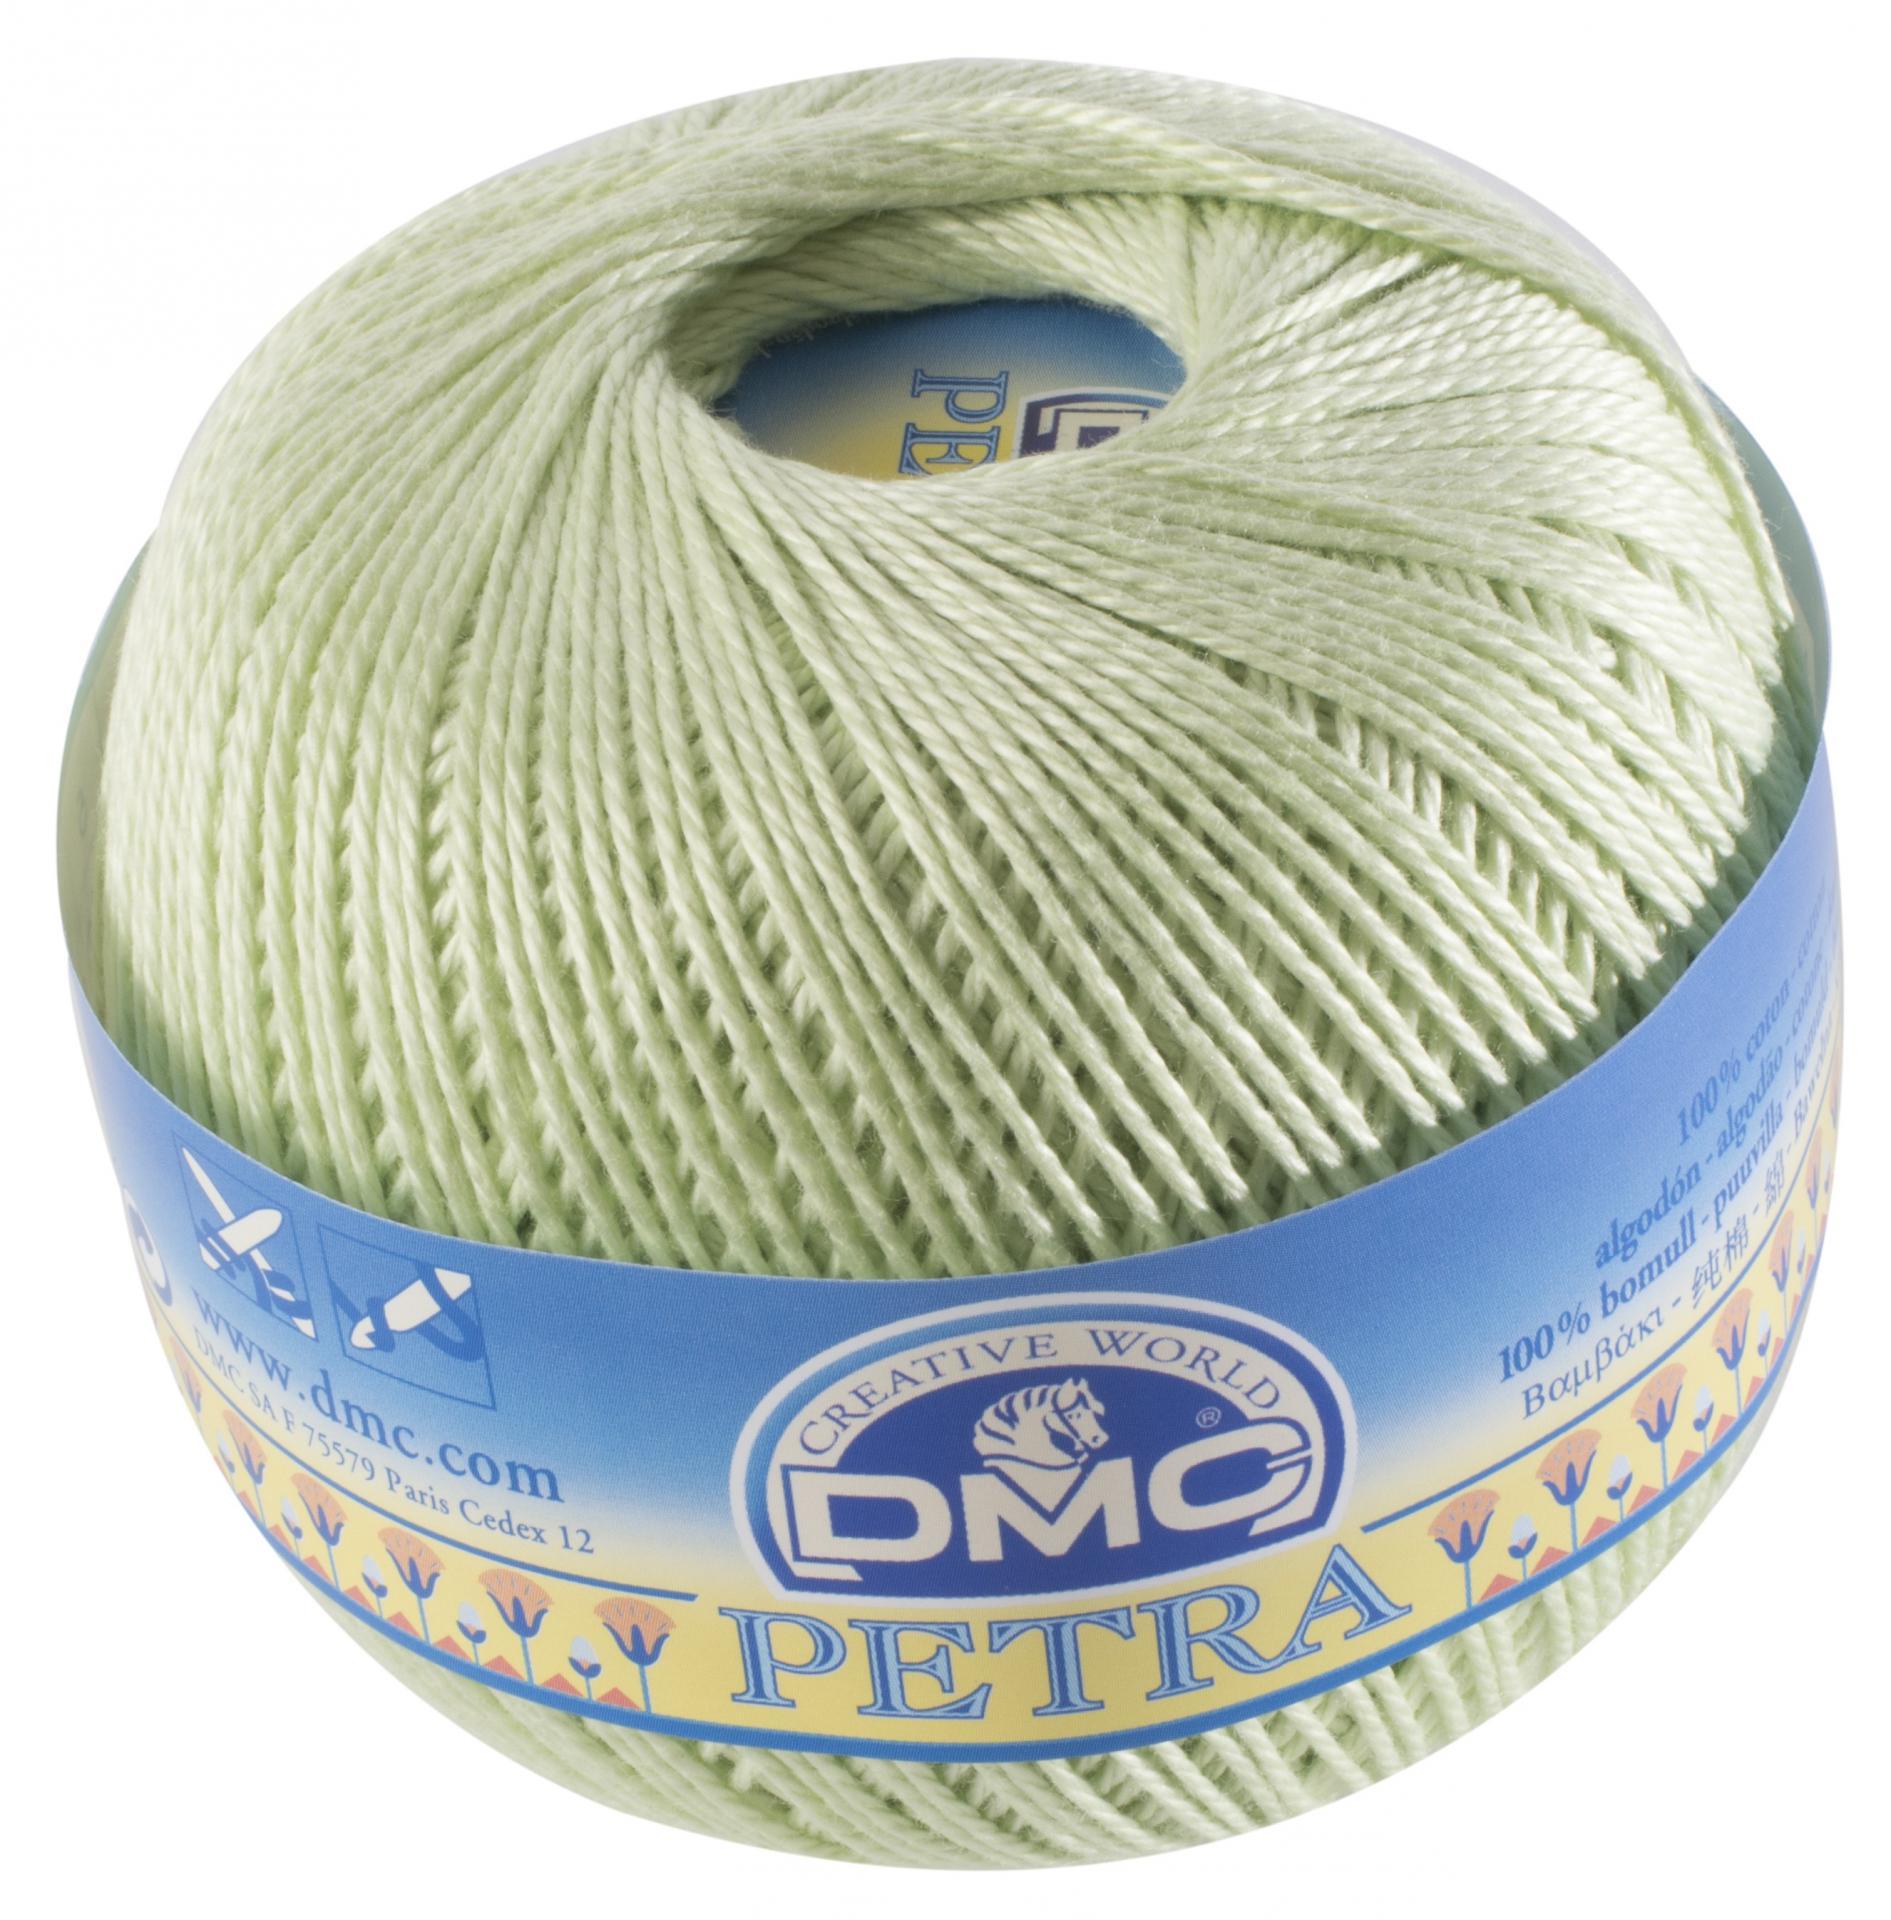 Dmc petra n 5 fil de coton unicolore 5772 pistache